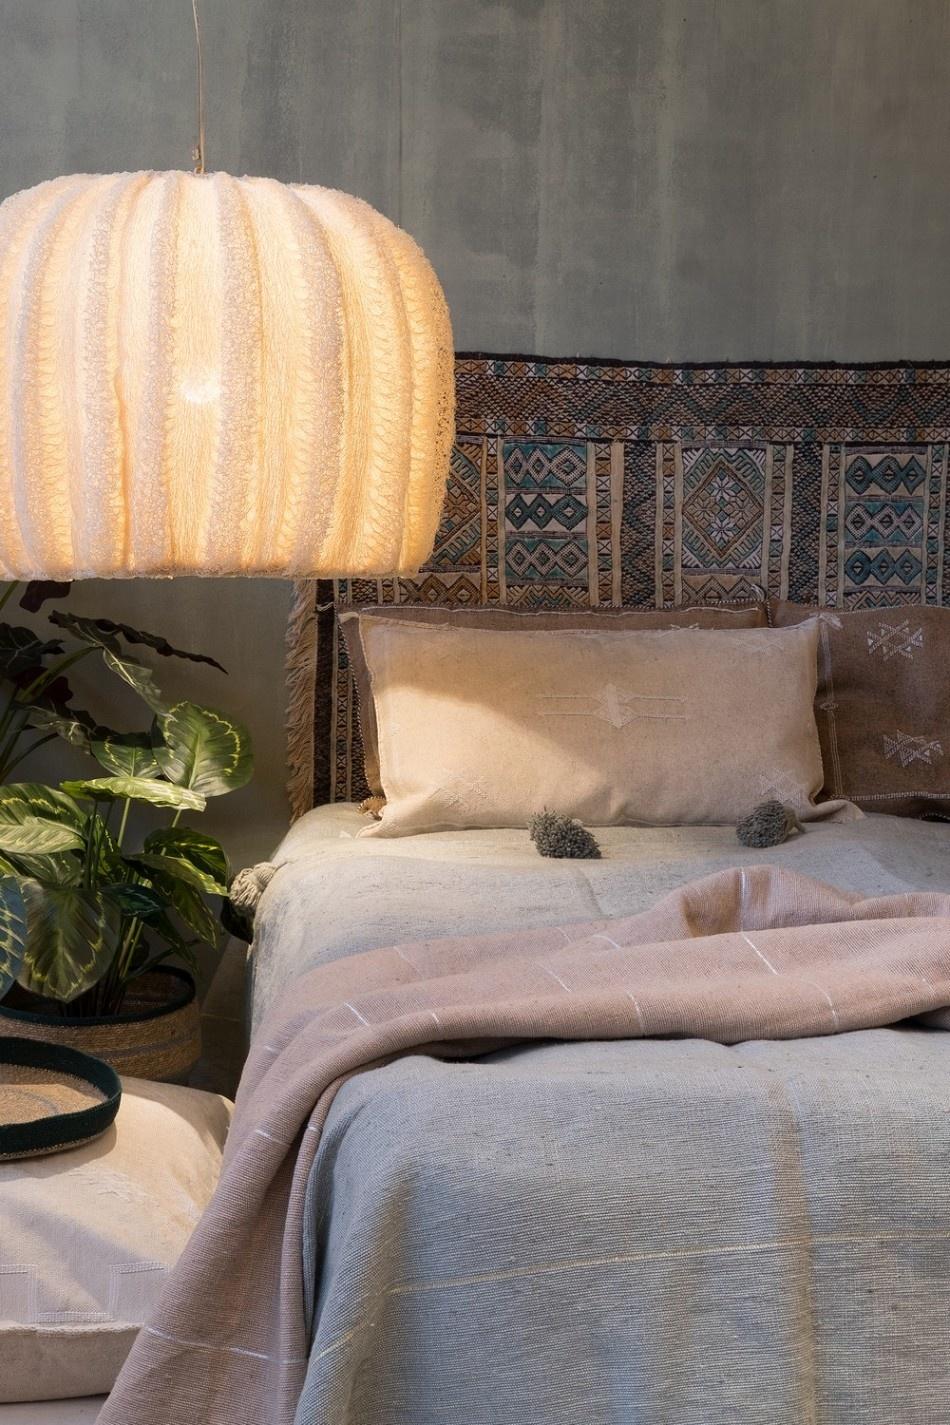 Petite Lily Interiors Cojín marroquí seda - Blanca Rota Oblong